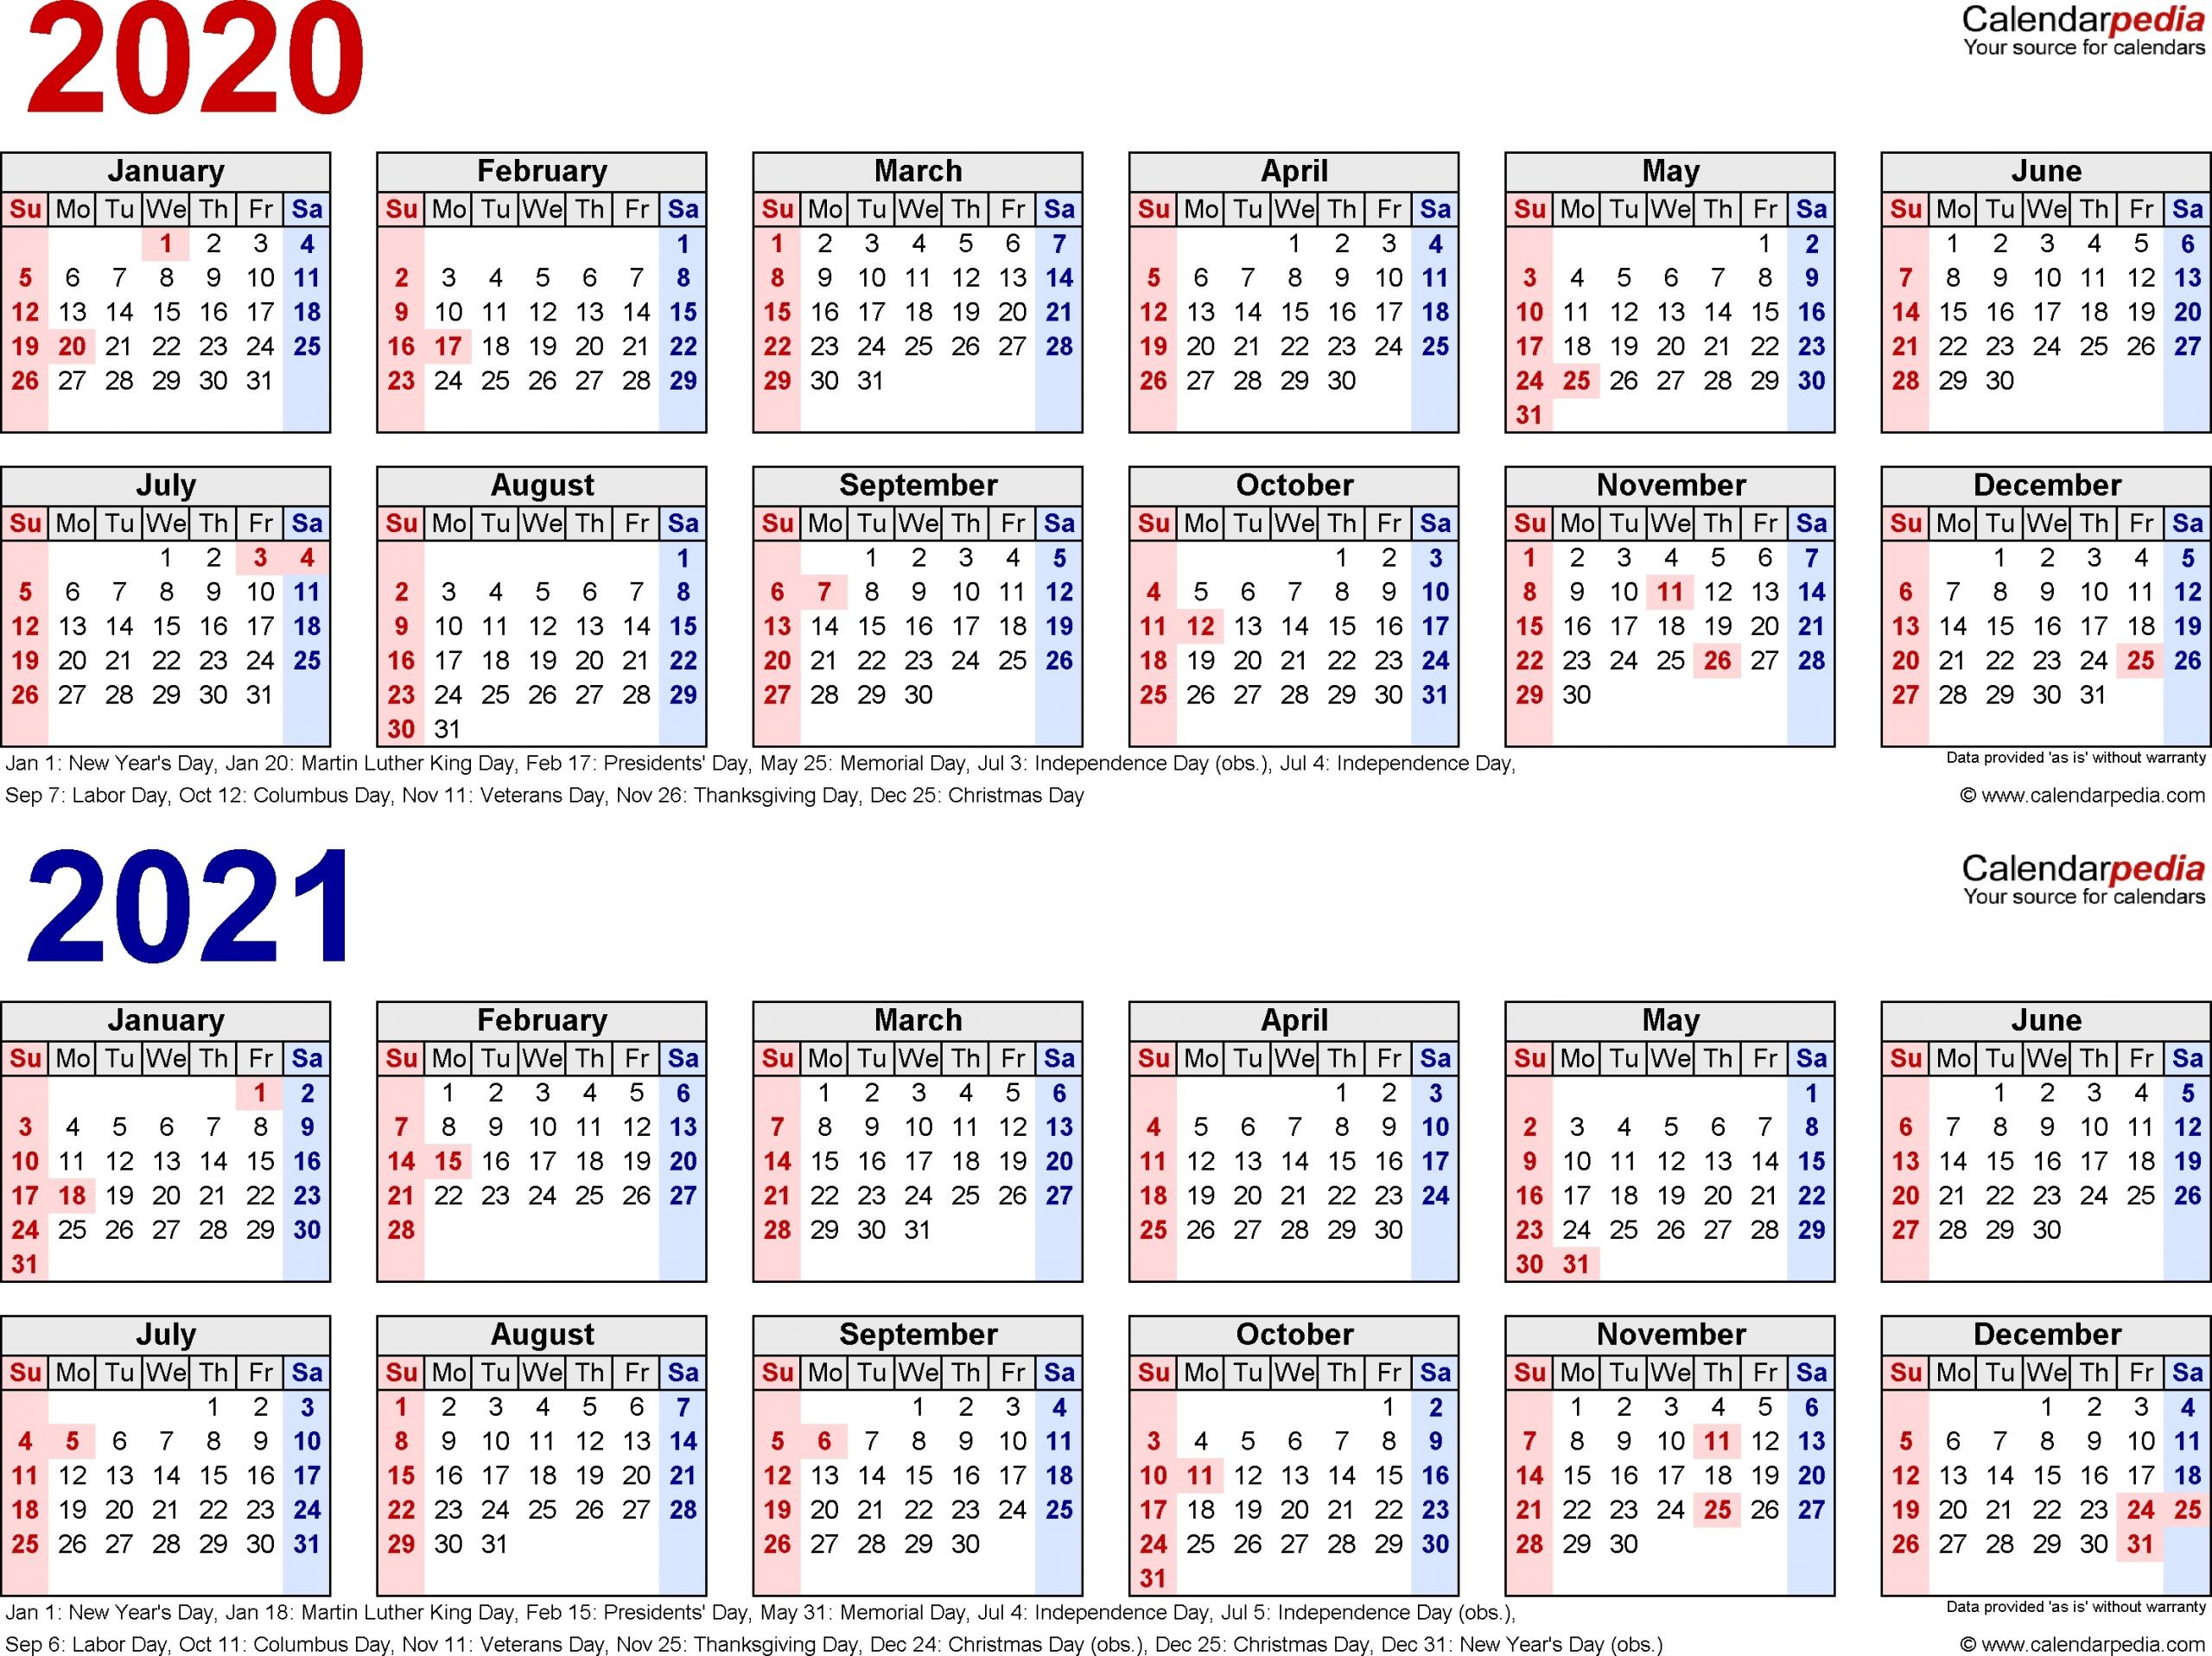 3 Year Calendar 2020 To 2021 | Month Calendar Printable-2021 Calnder By Week No Excel